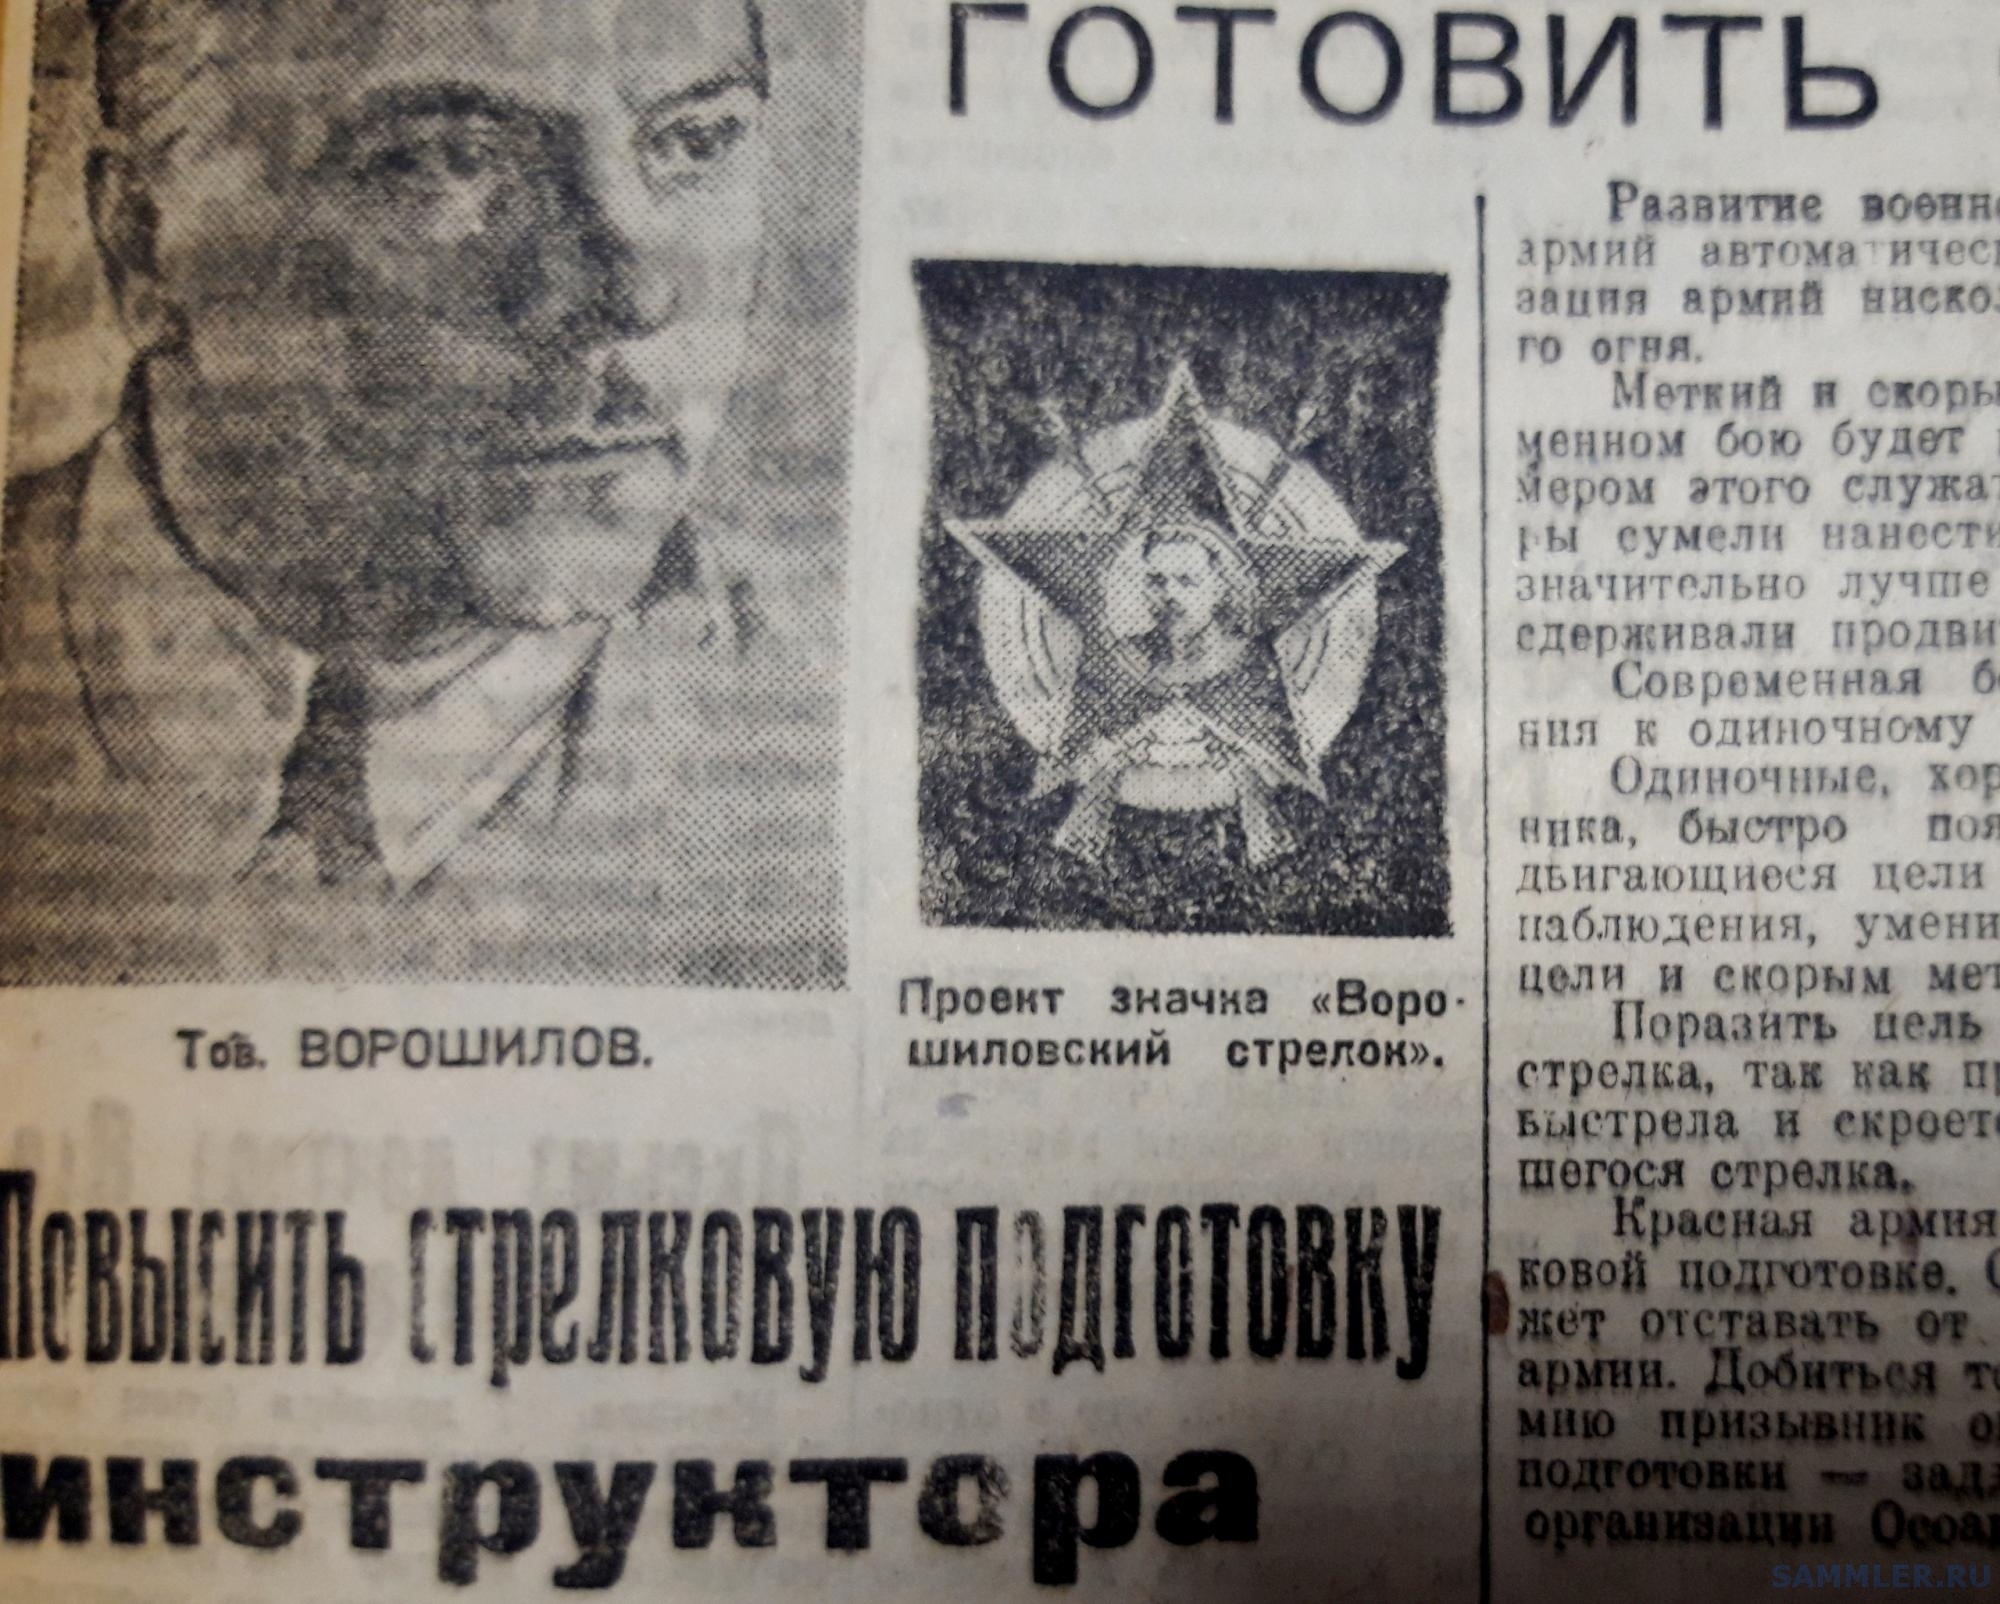 Проект знака Ворошиловский стрелок.jpg